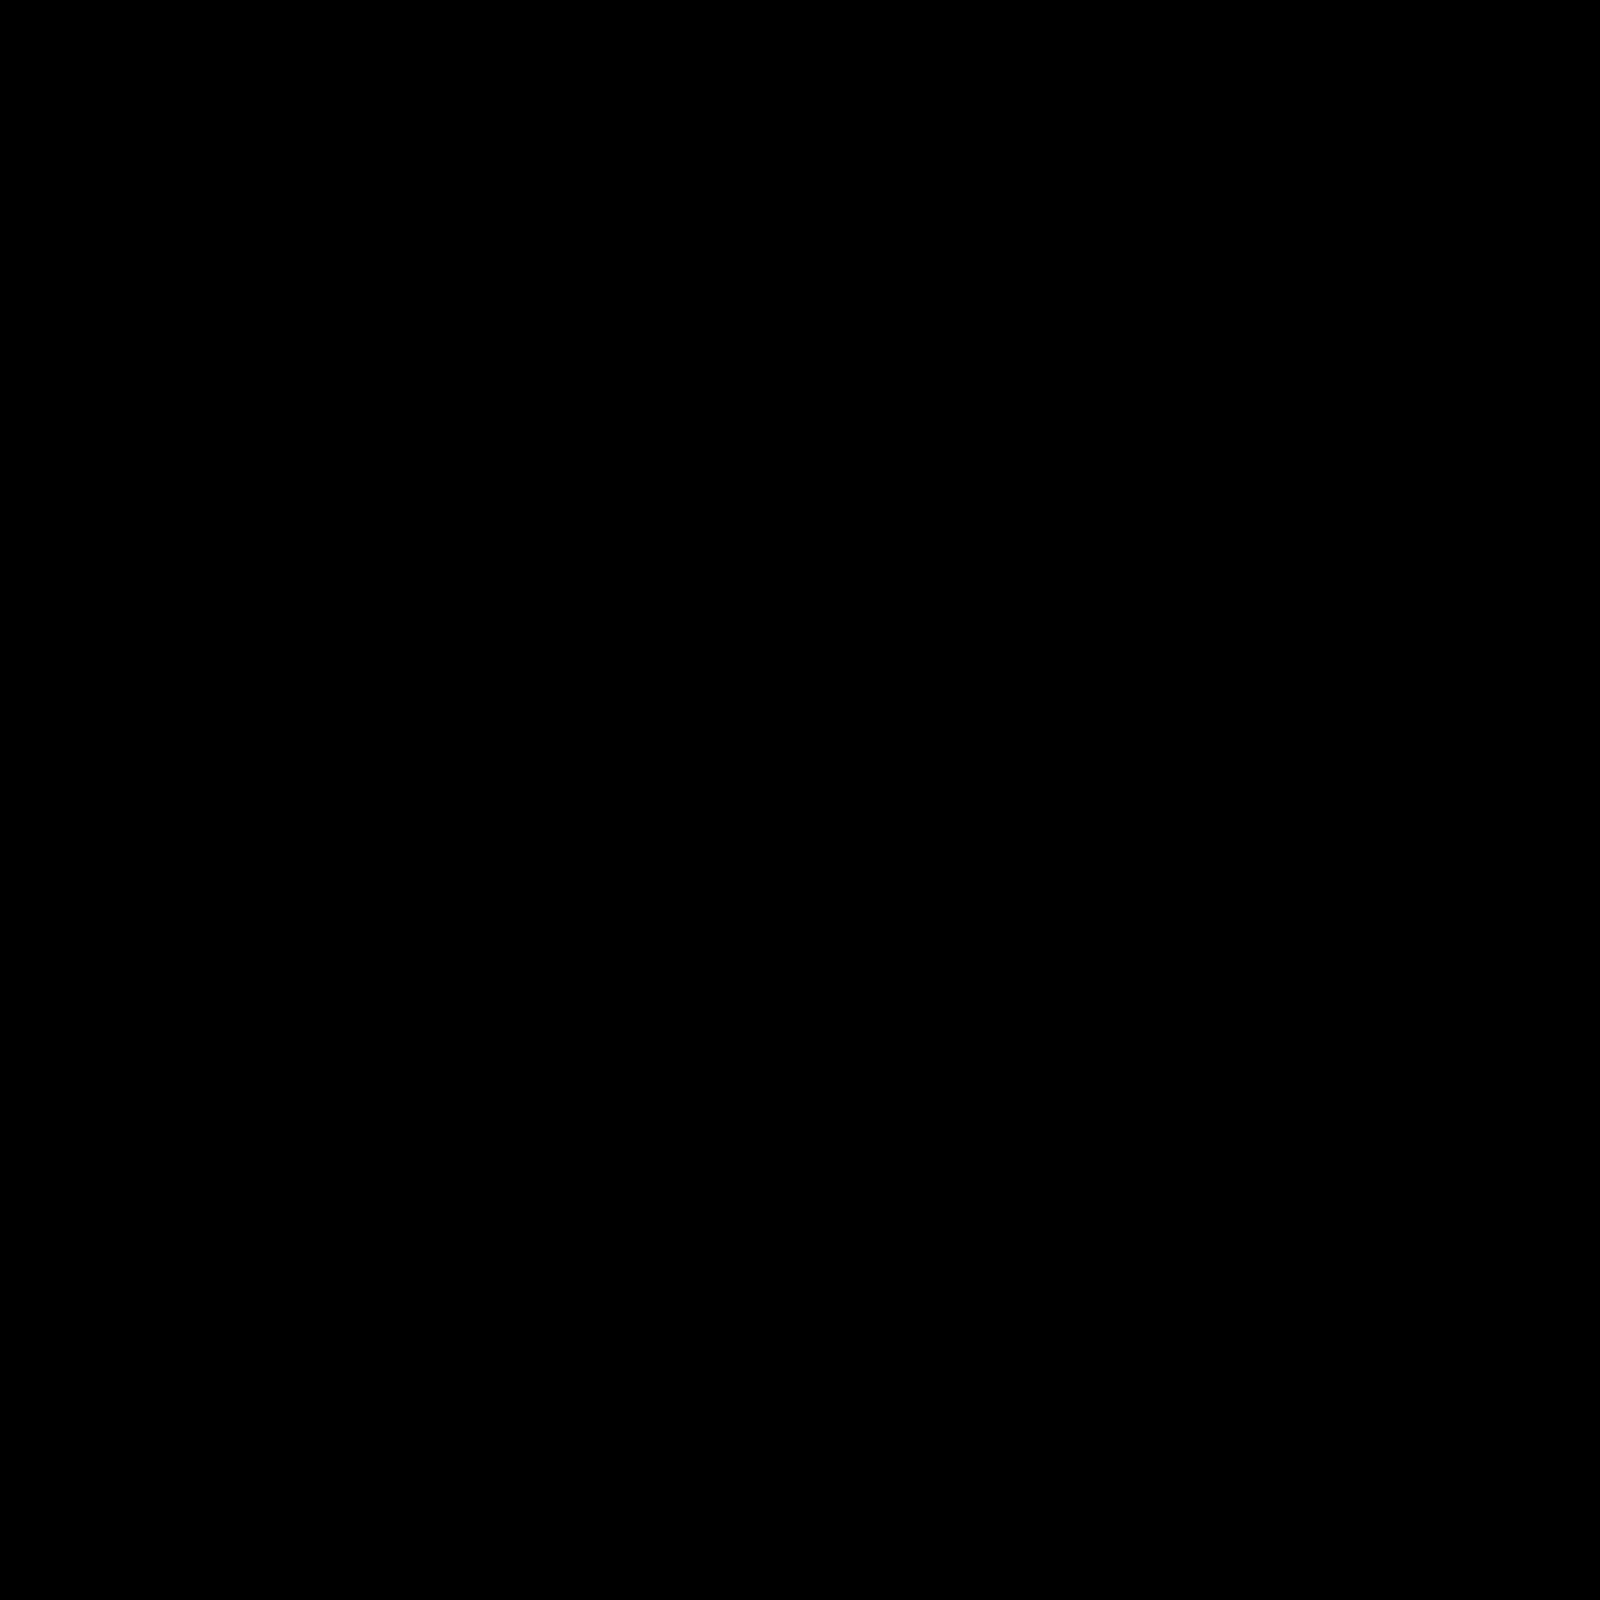 Metal Inert Gas Welding Filled icon